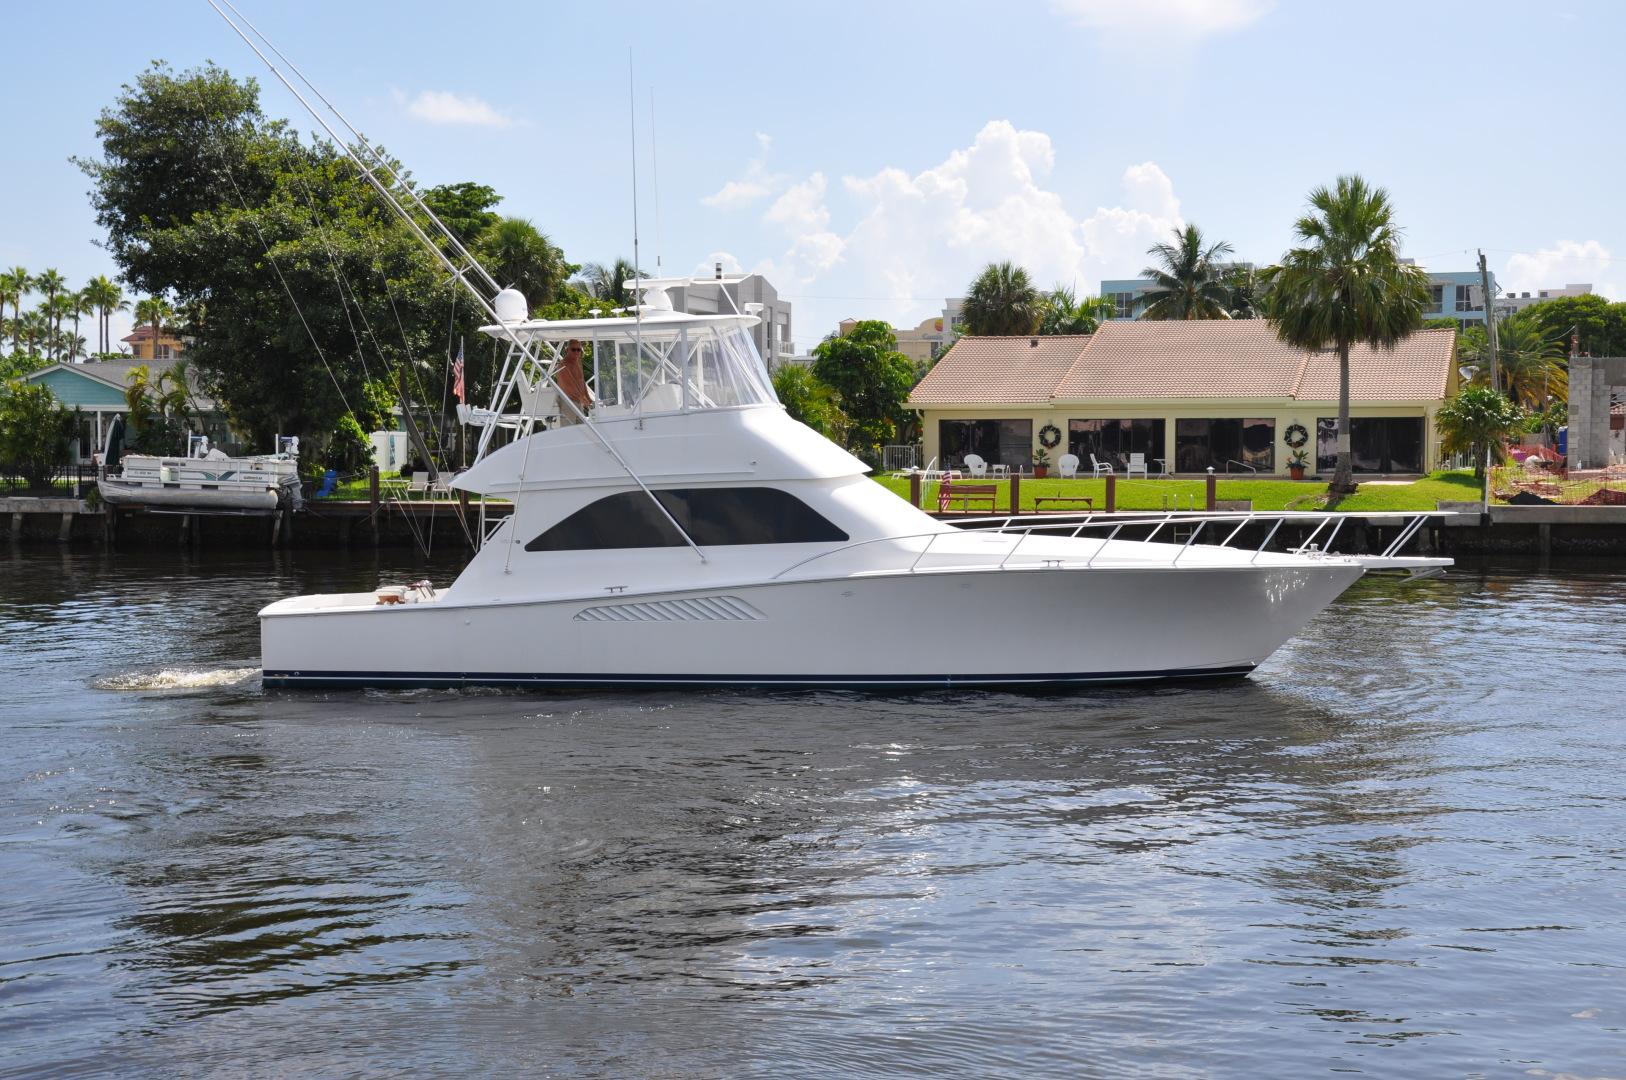 Viking-Convertible 2003-Reel Cowboy Deerfield Beach-Florida-United States-Profile-1546866 | Thumbnail